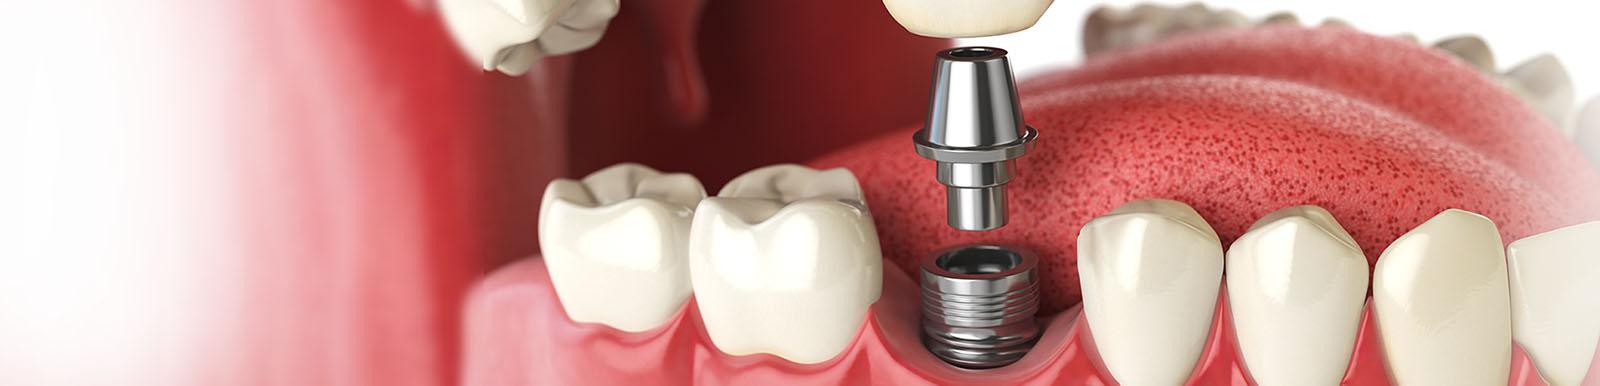 Human teeth implant dental concept